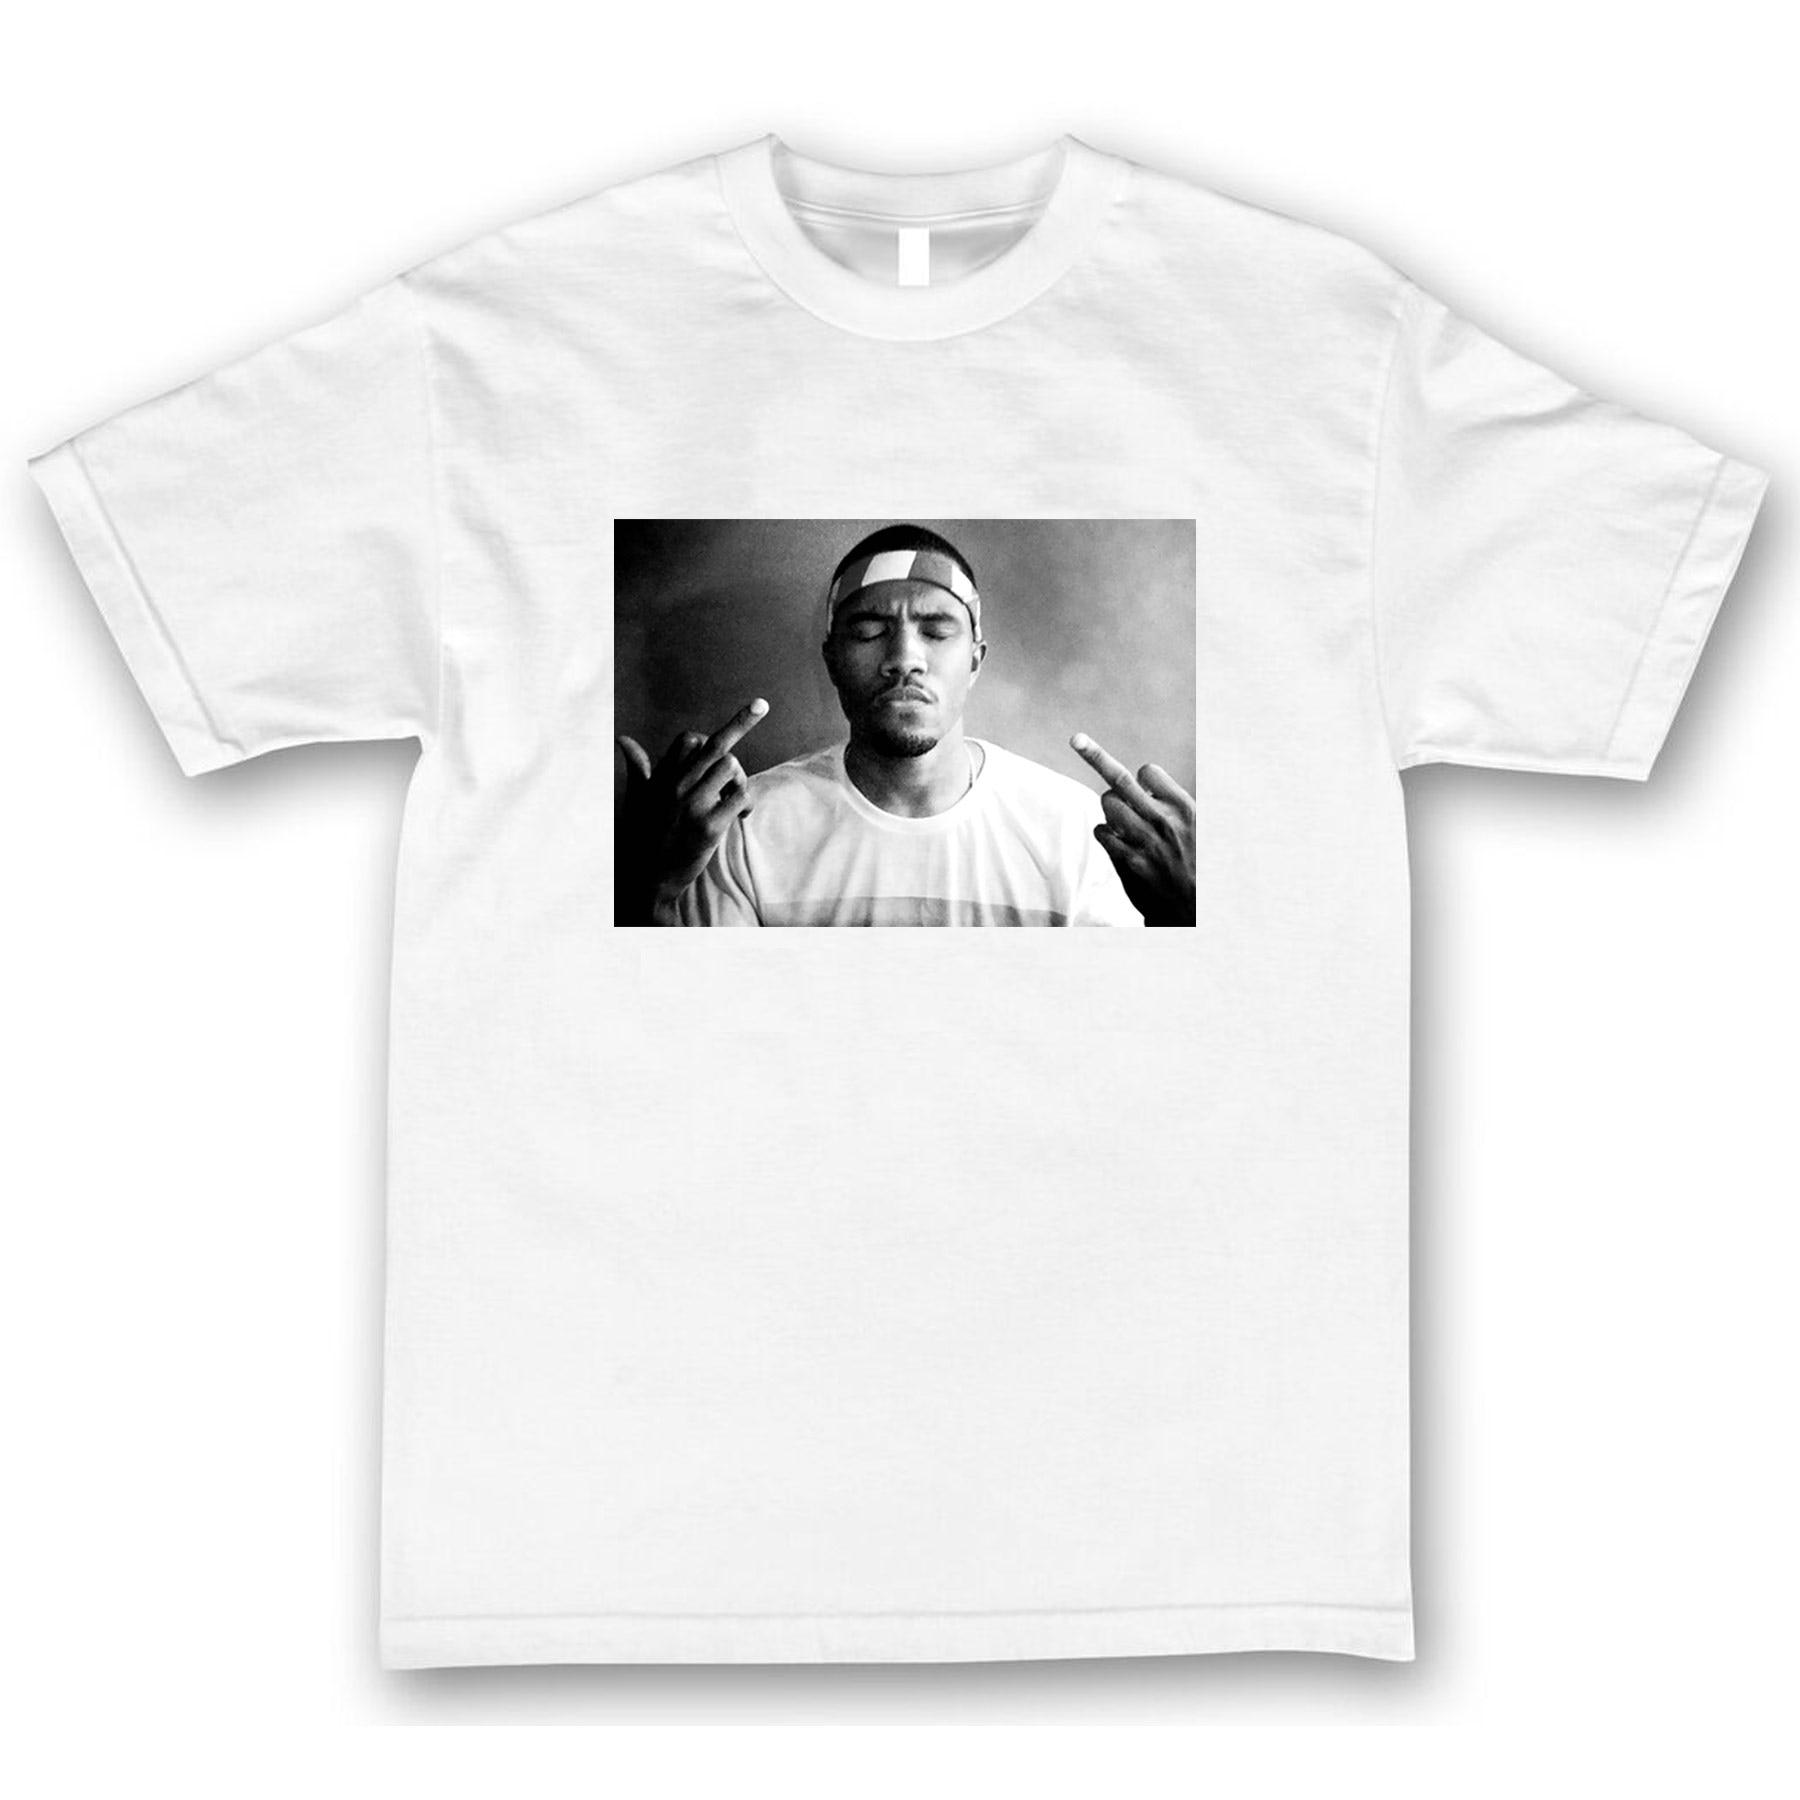 Frank Ocean T Shirt Boys Don T Cry Blonde Blond Trapsoul Rap Hiphop New